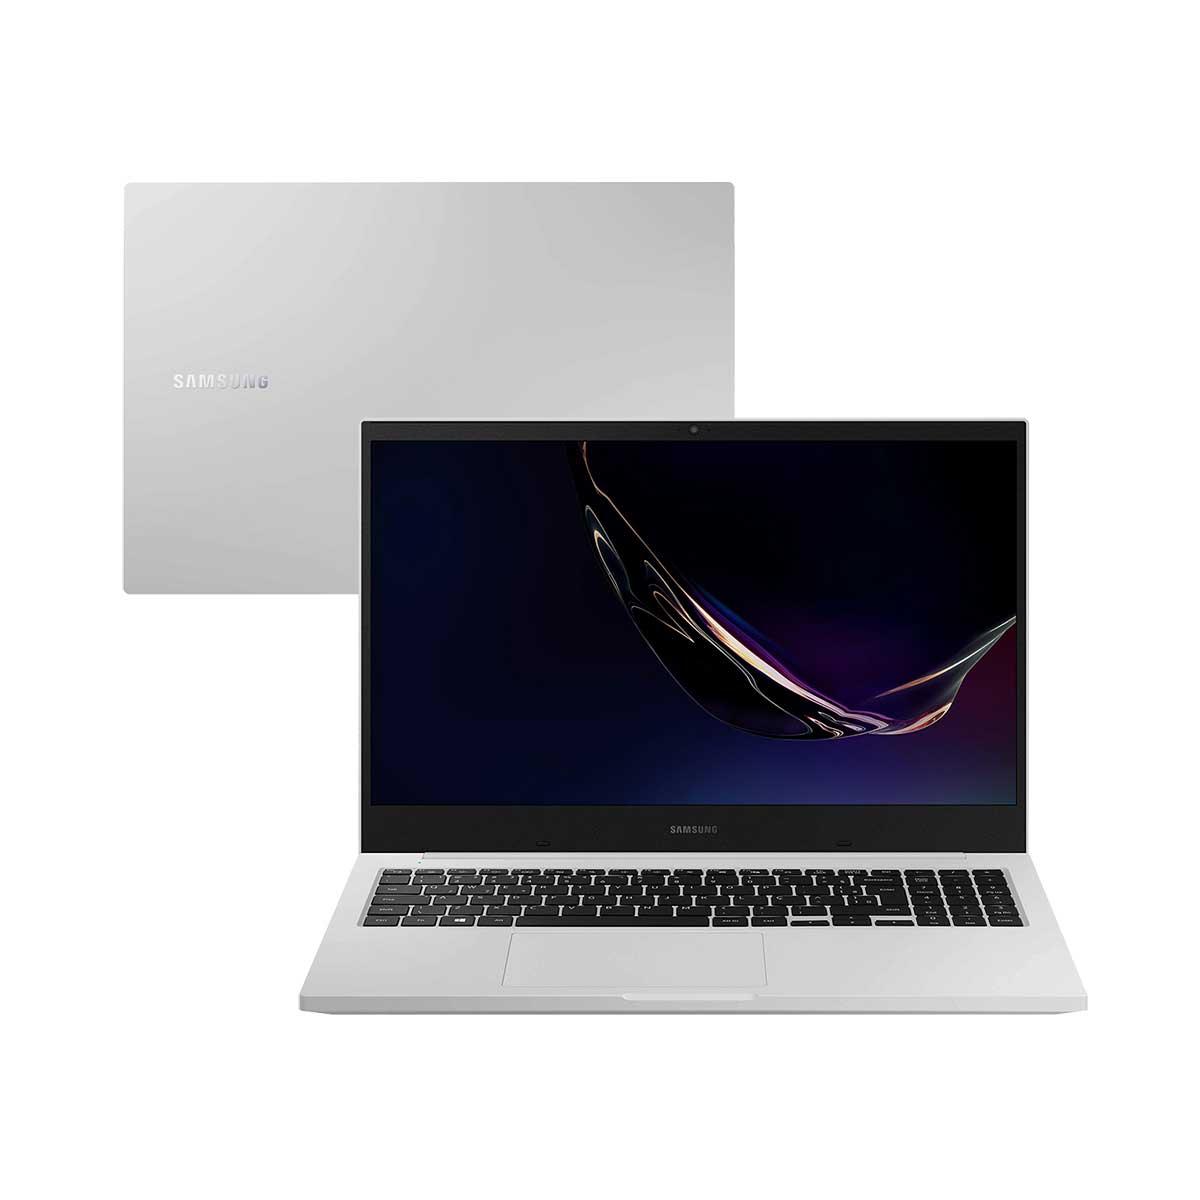 Imagem de Notebook Samsung Book Intel Core I3-1115g4 4gb 1tb W10 Fhd 15.6